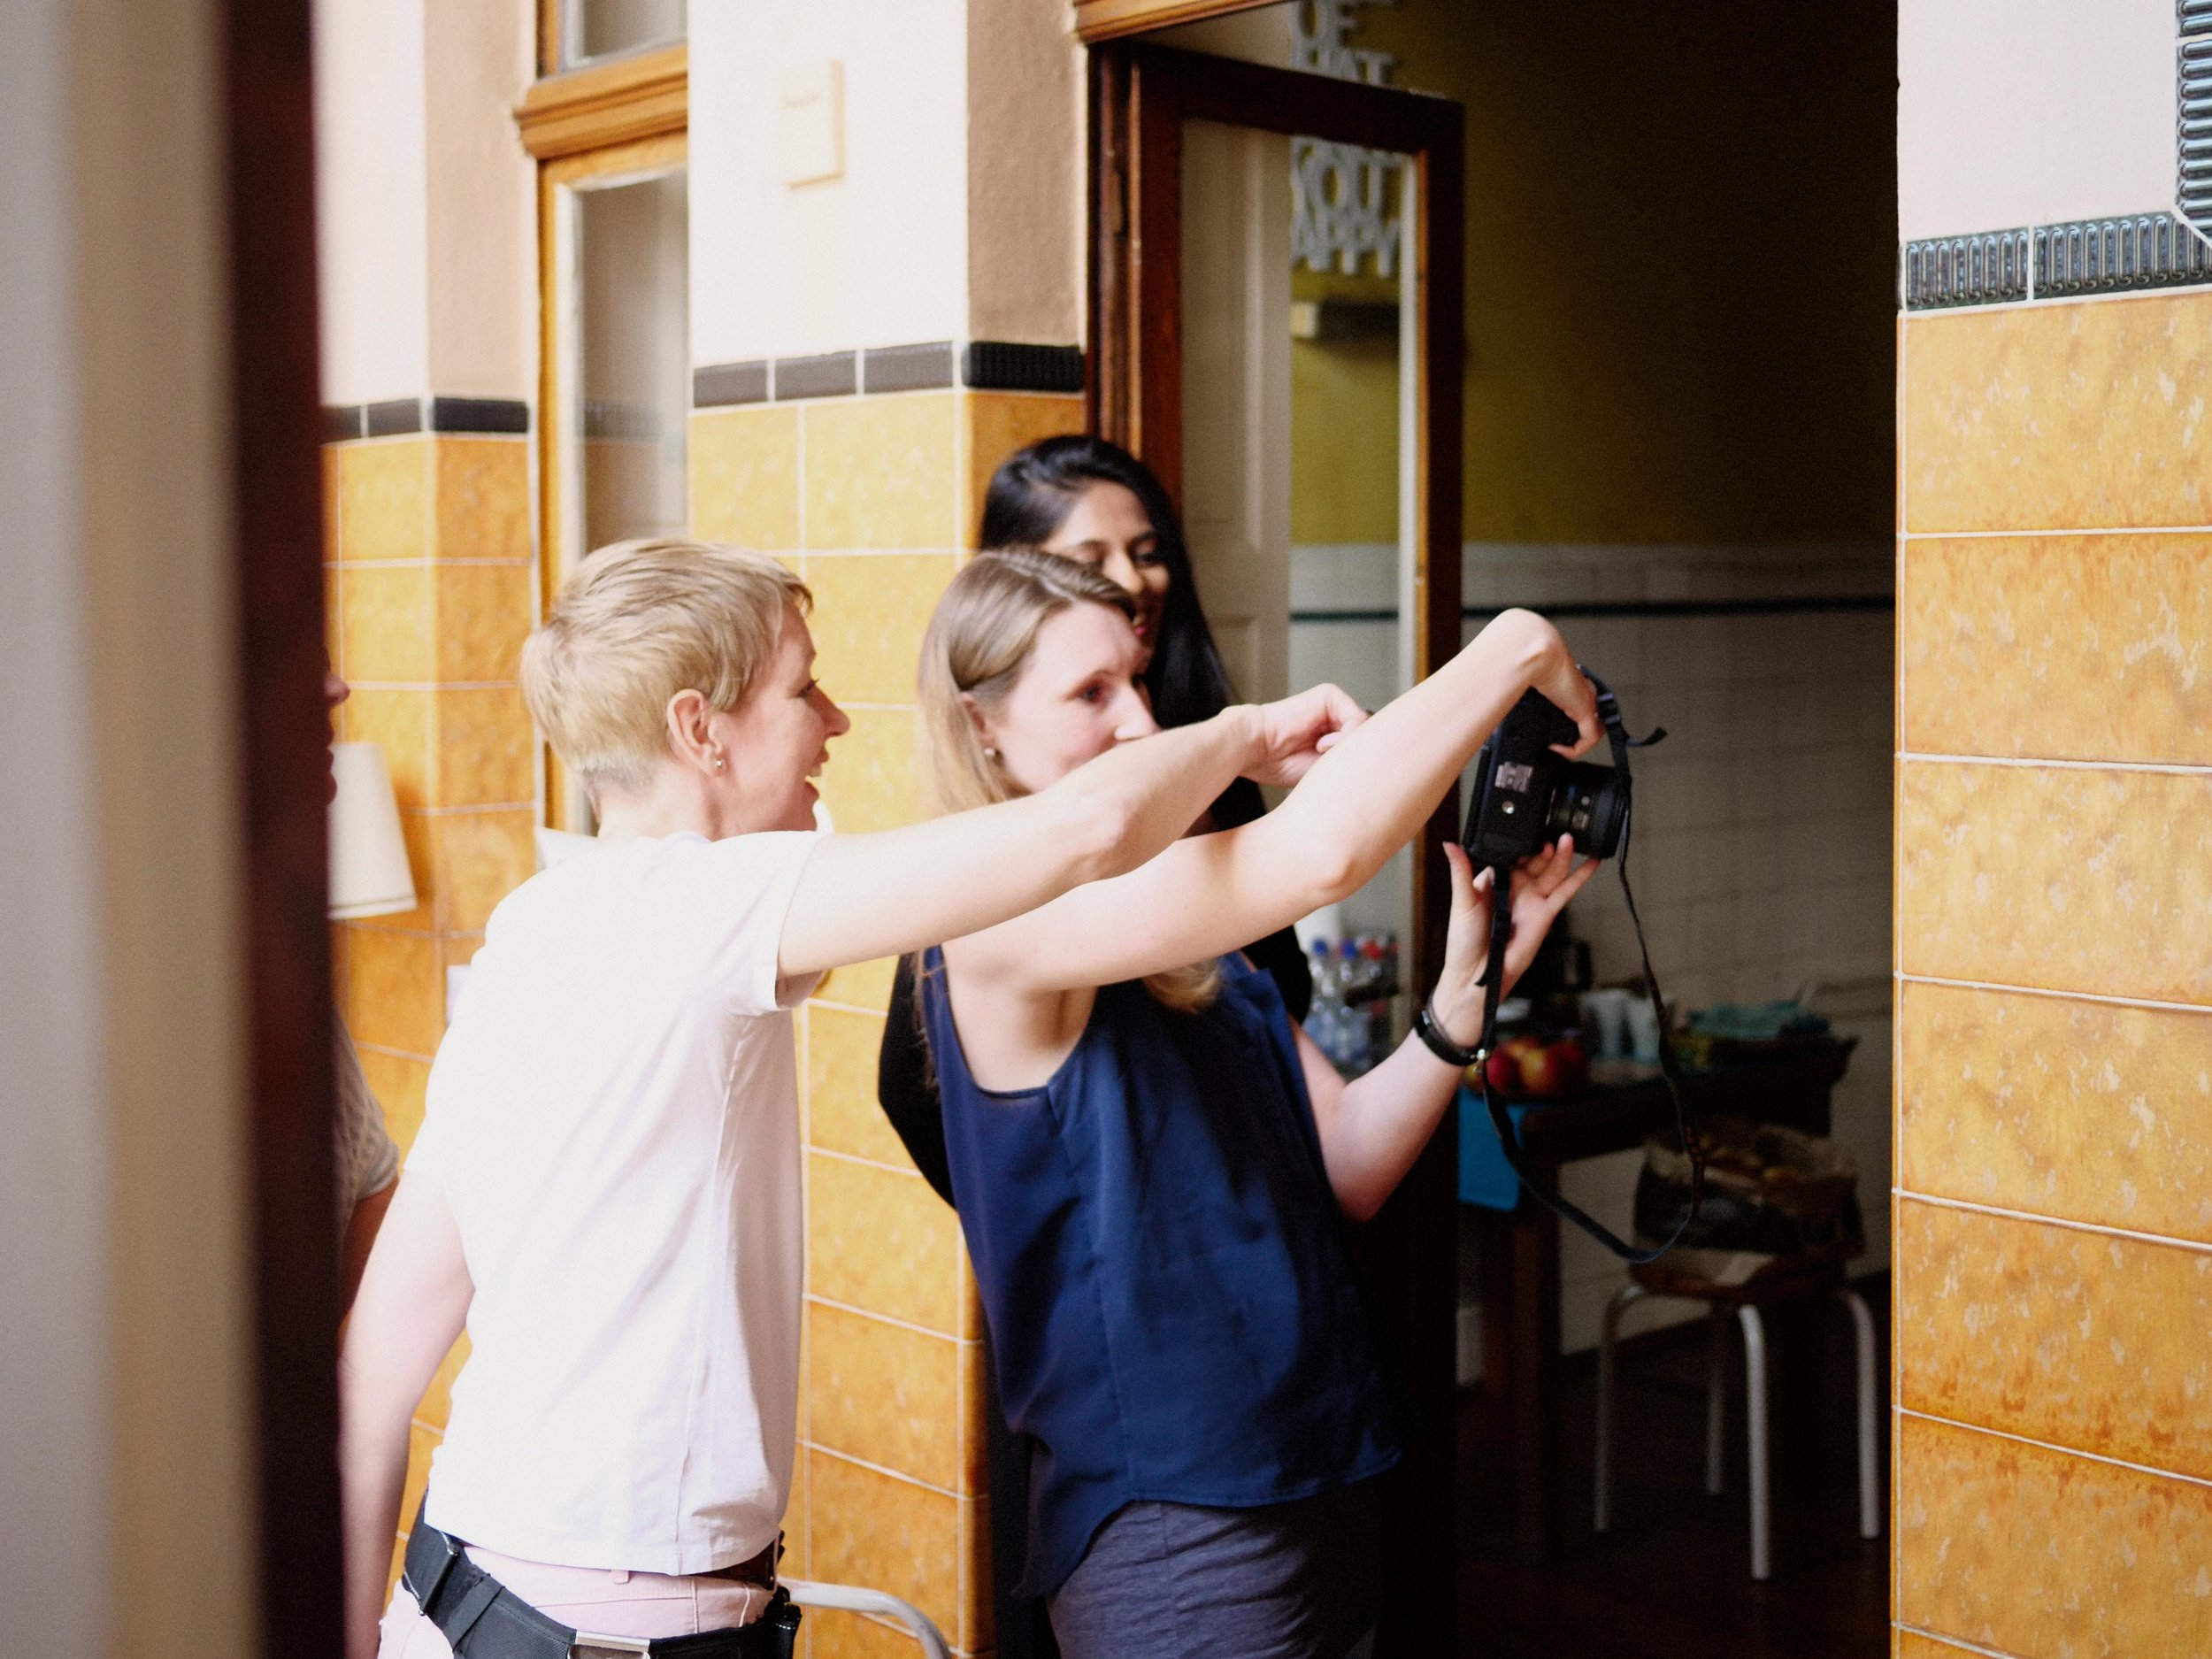 Workshop für Fotografie Portraitfotografie in Bonn Masterclass Fotostudio Daniel Hammelstein P1081413_Exp.jpg